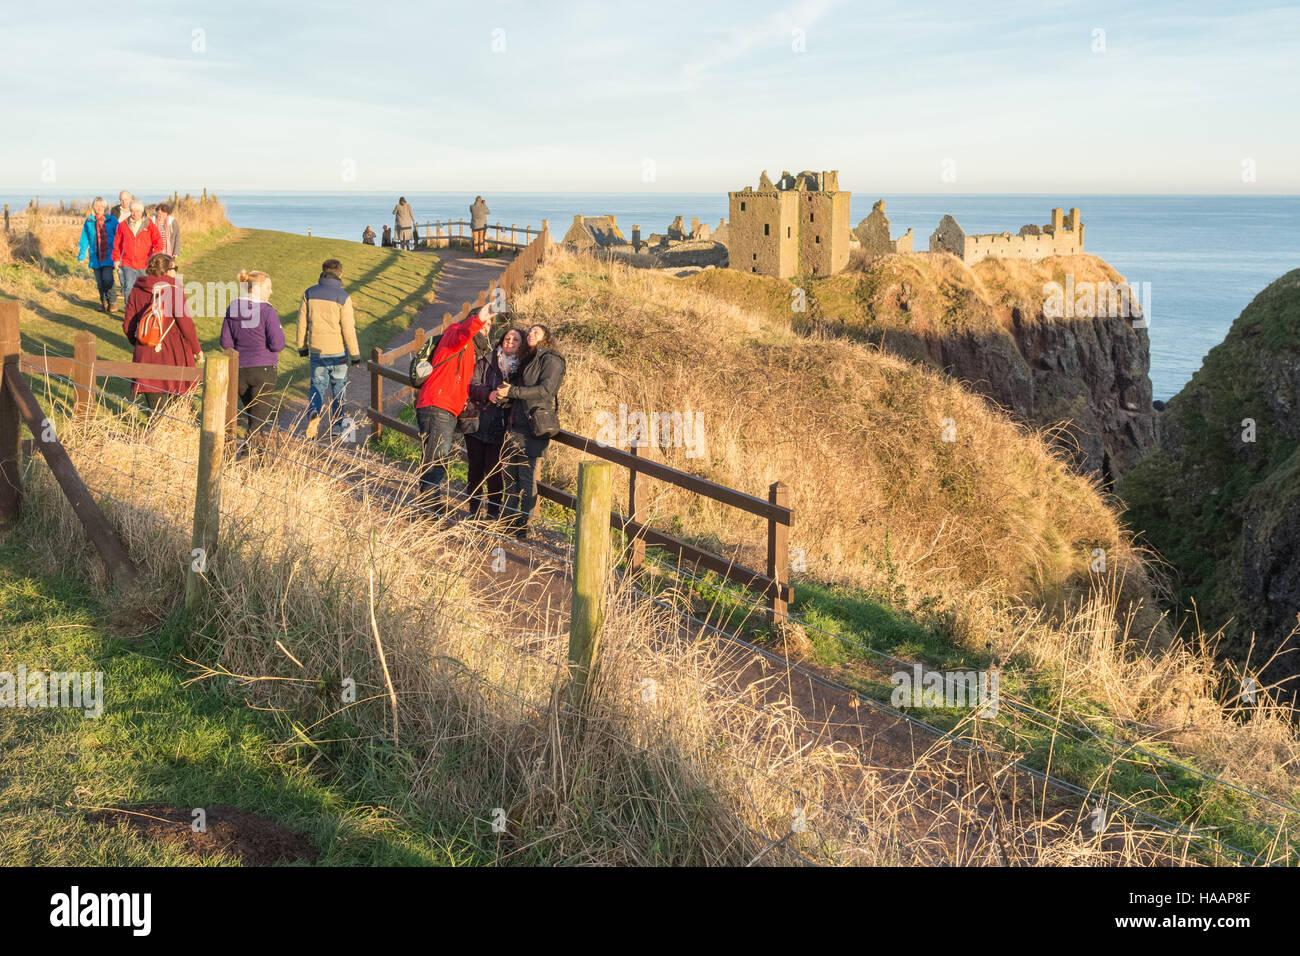 Dunnottar Castle, Stonehaven, Scotland - visitors enjoying the winter sunset - Stock Image